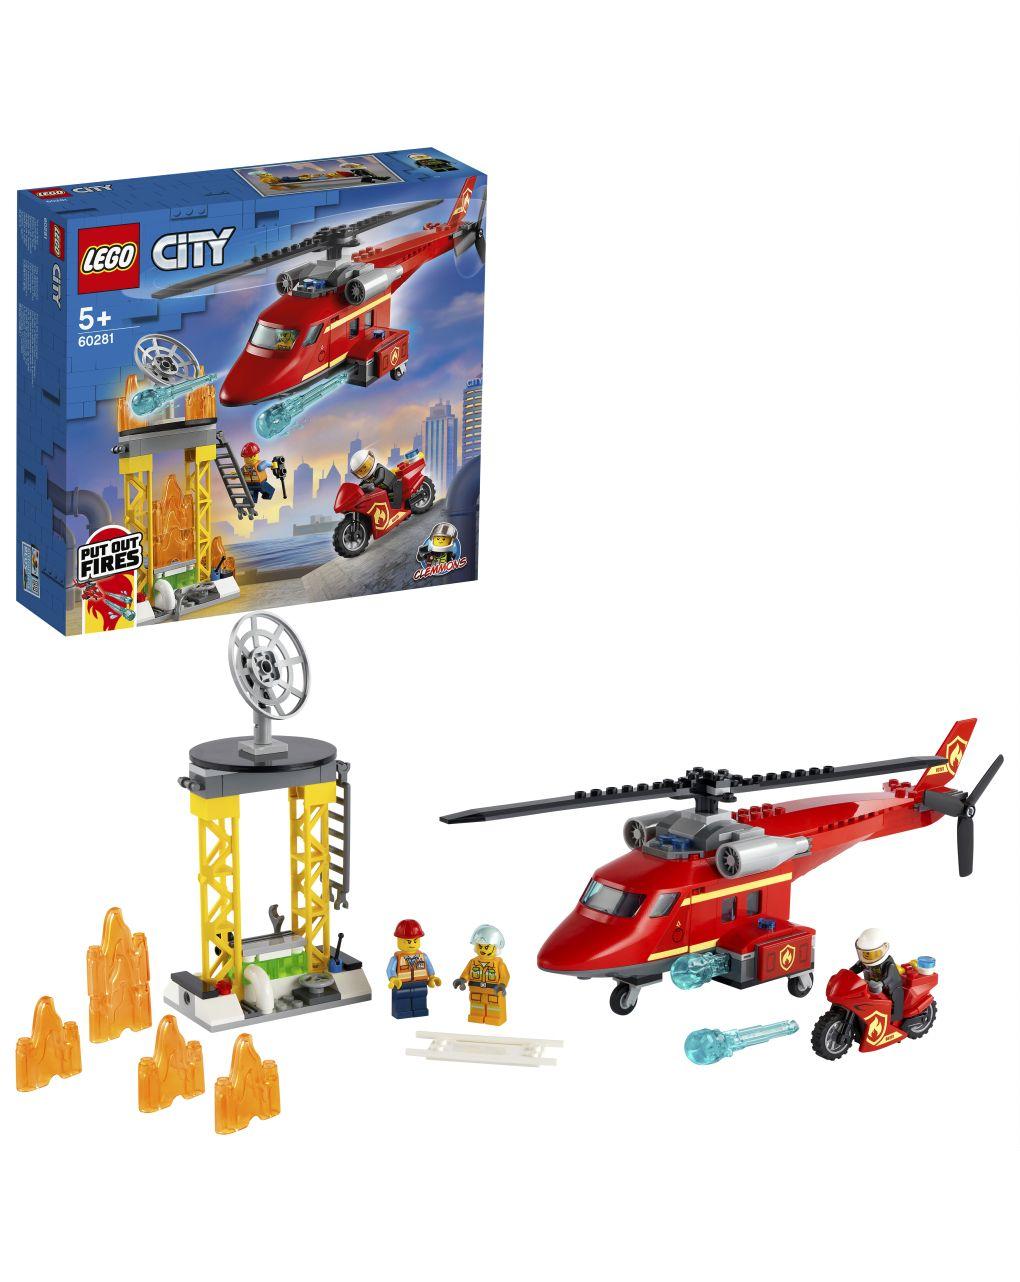 Lego city fire - elicottero antincendio - 60281 - LEGO